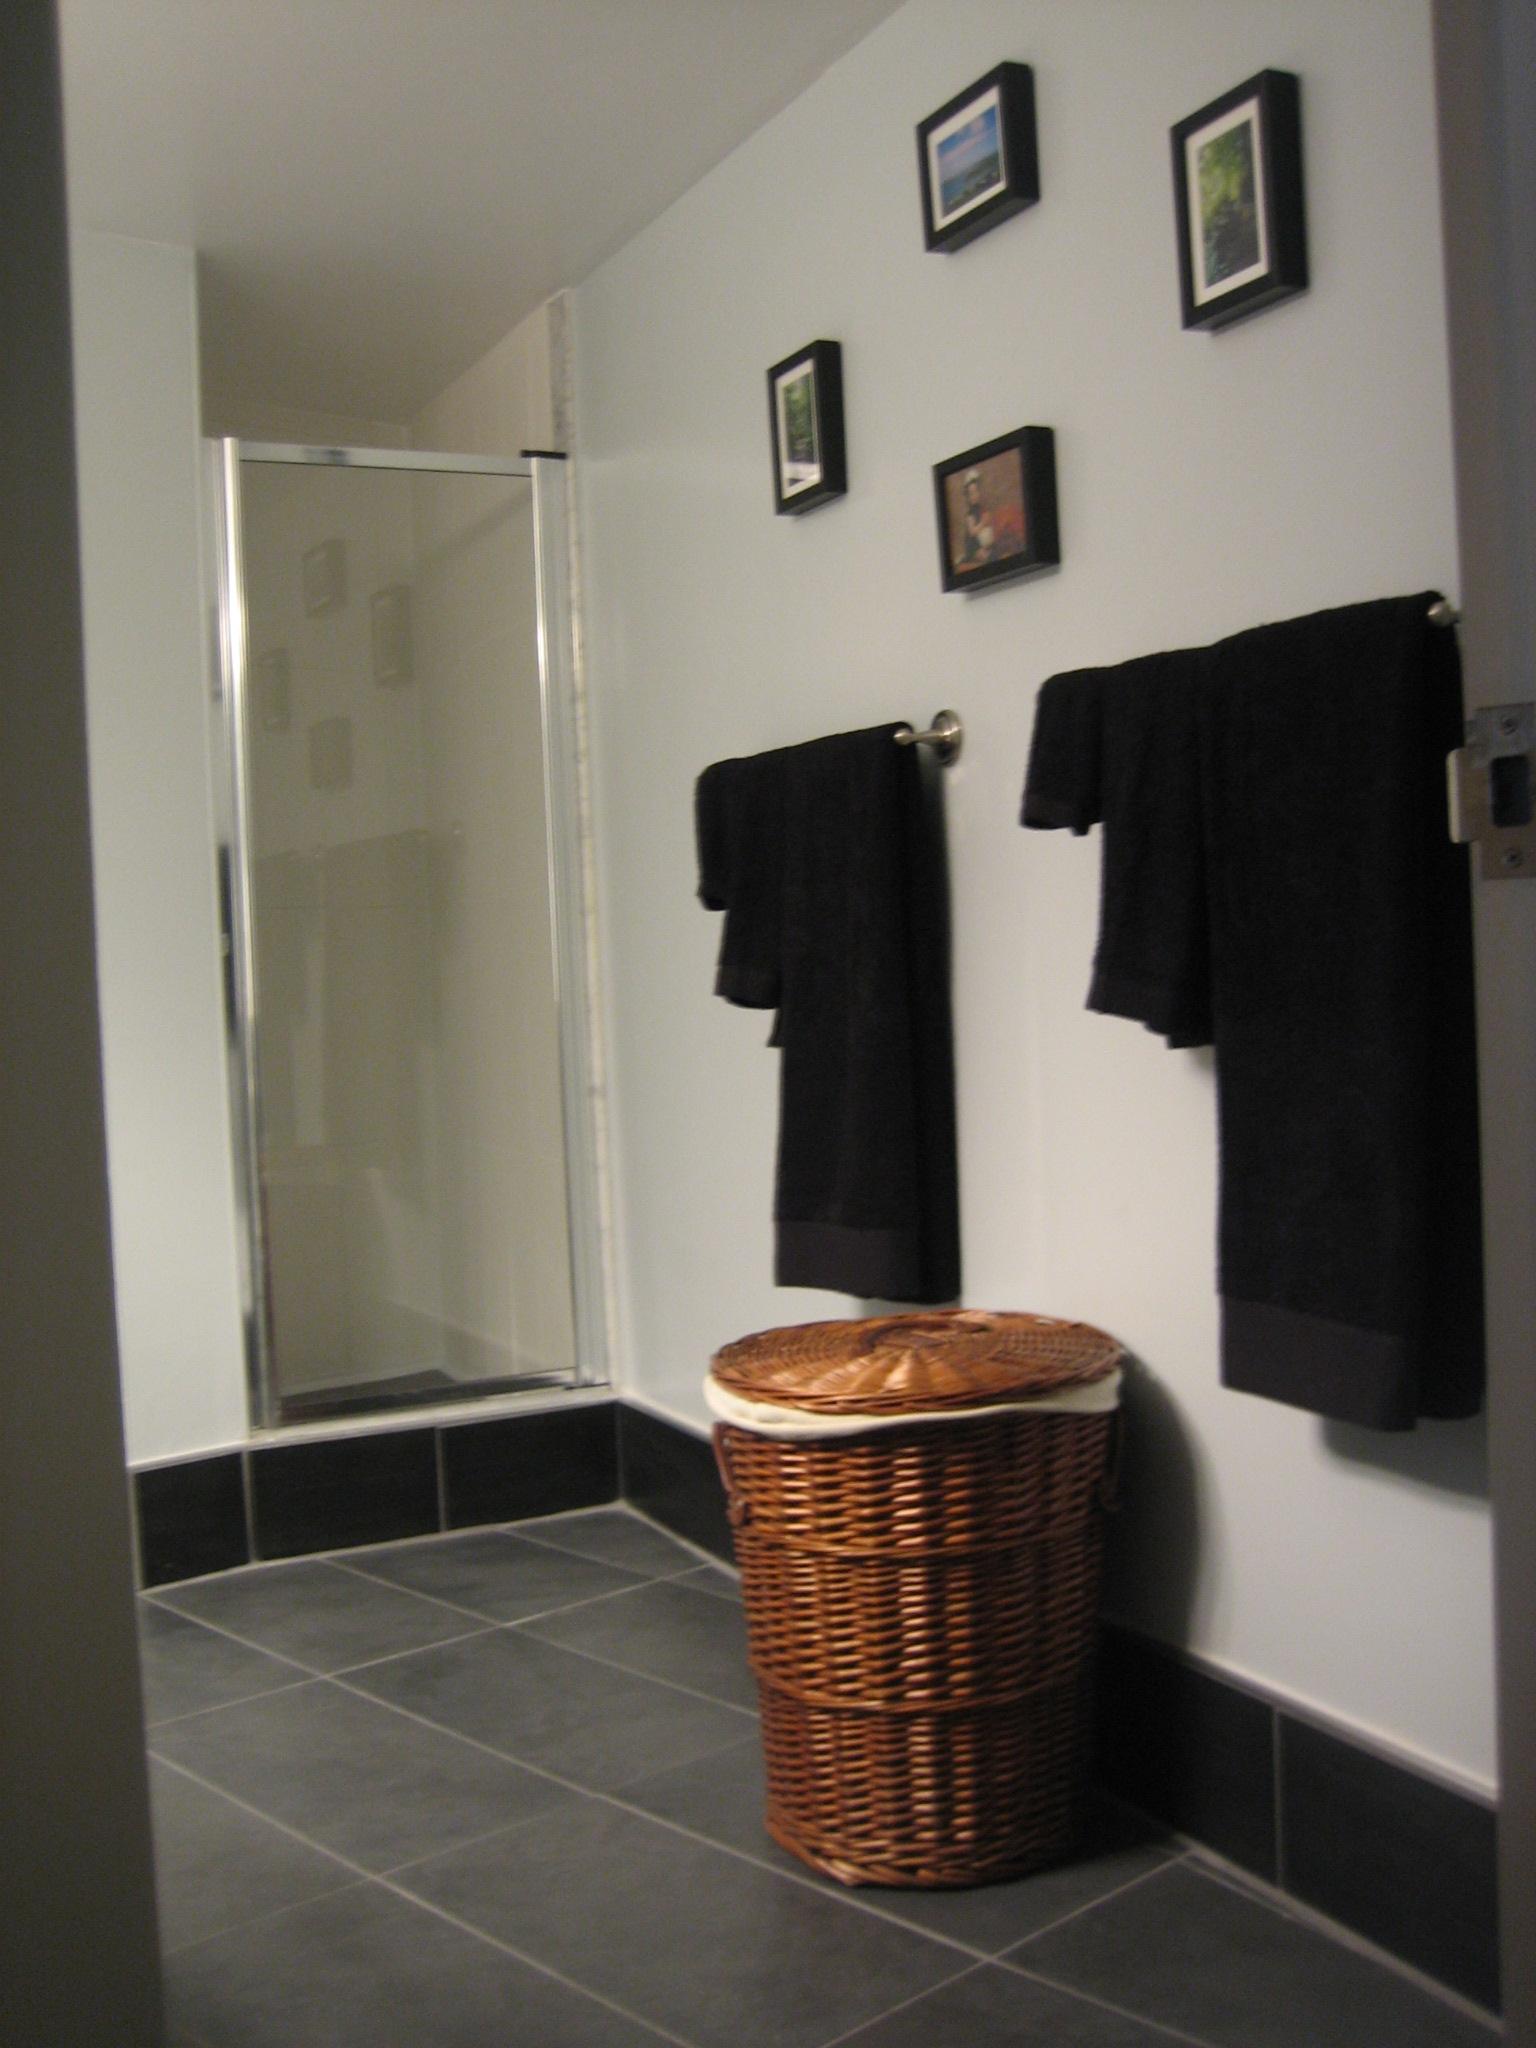 Condo Reno Washroom - shows length 2007.JPG